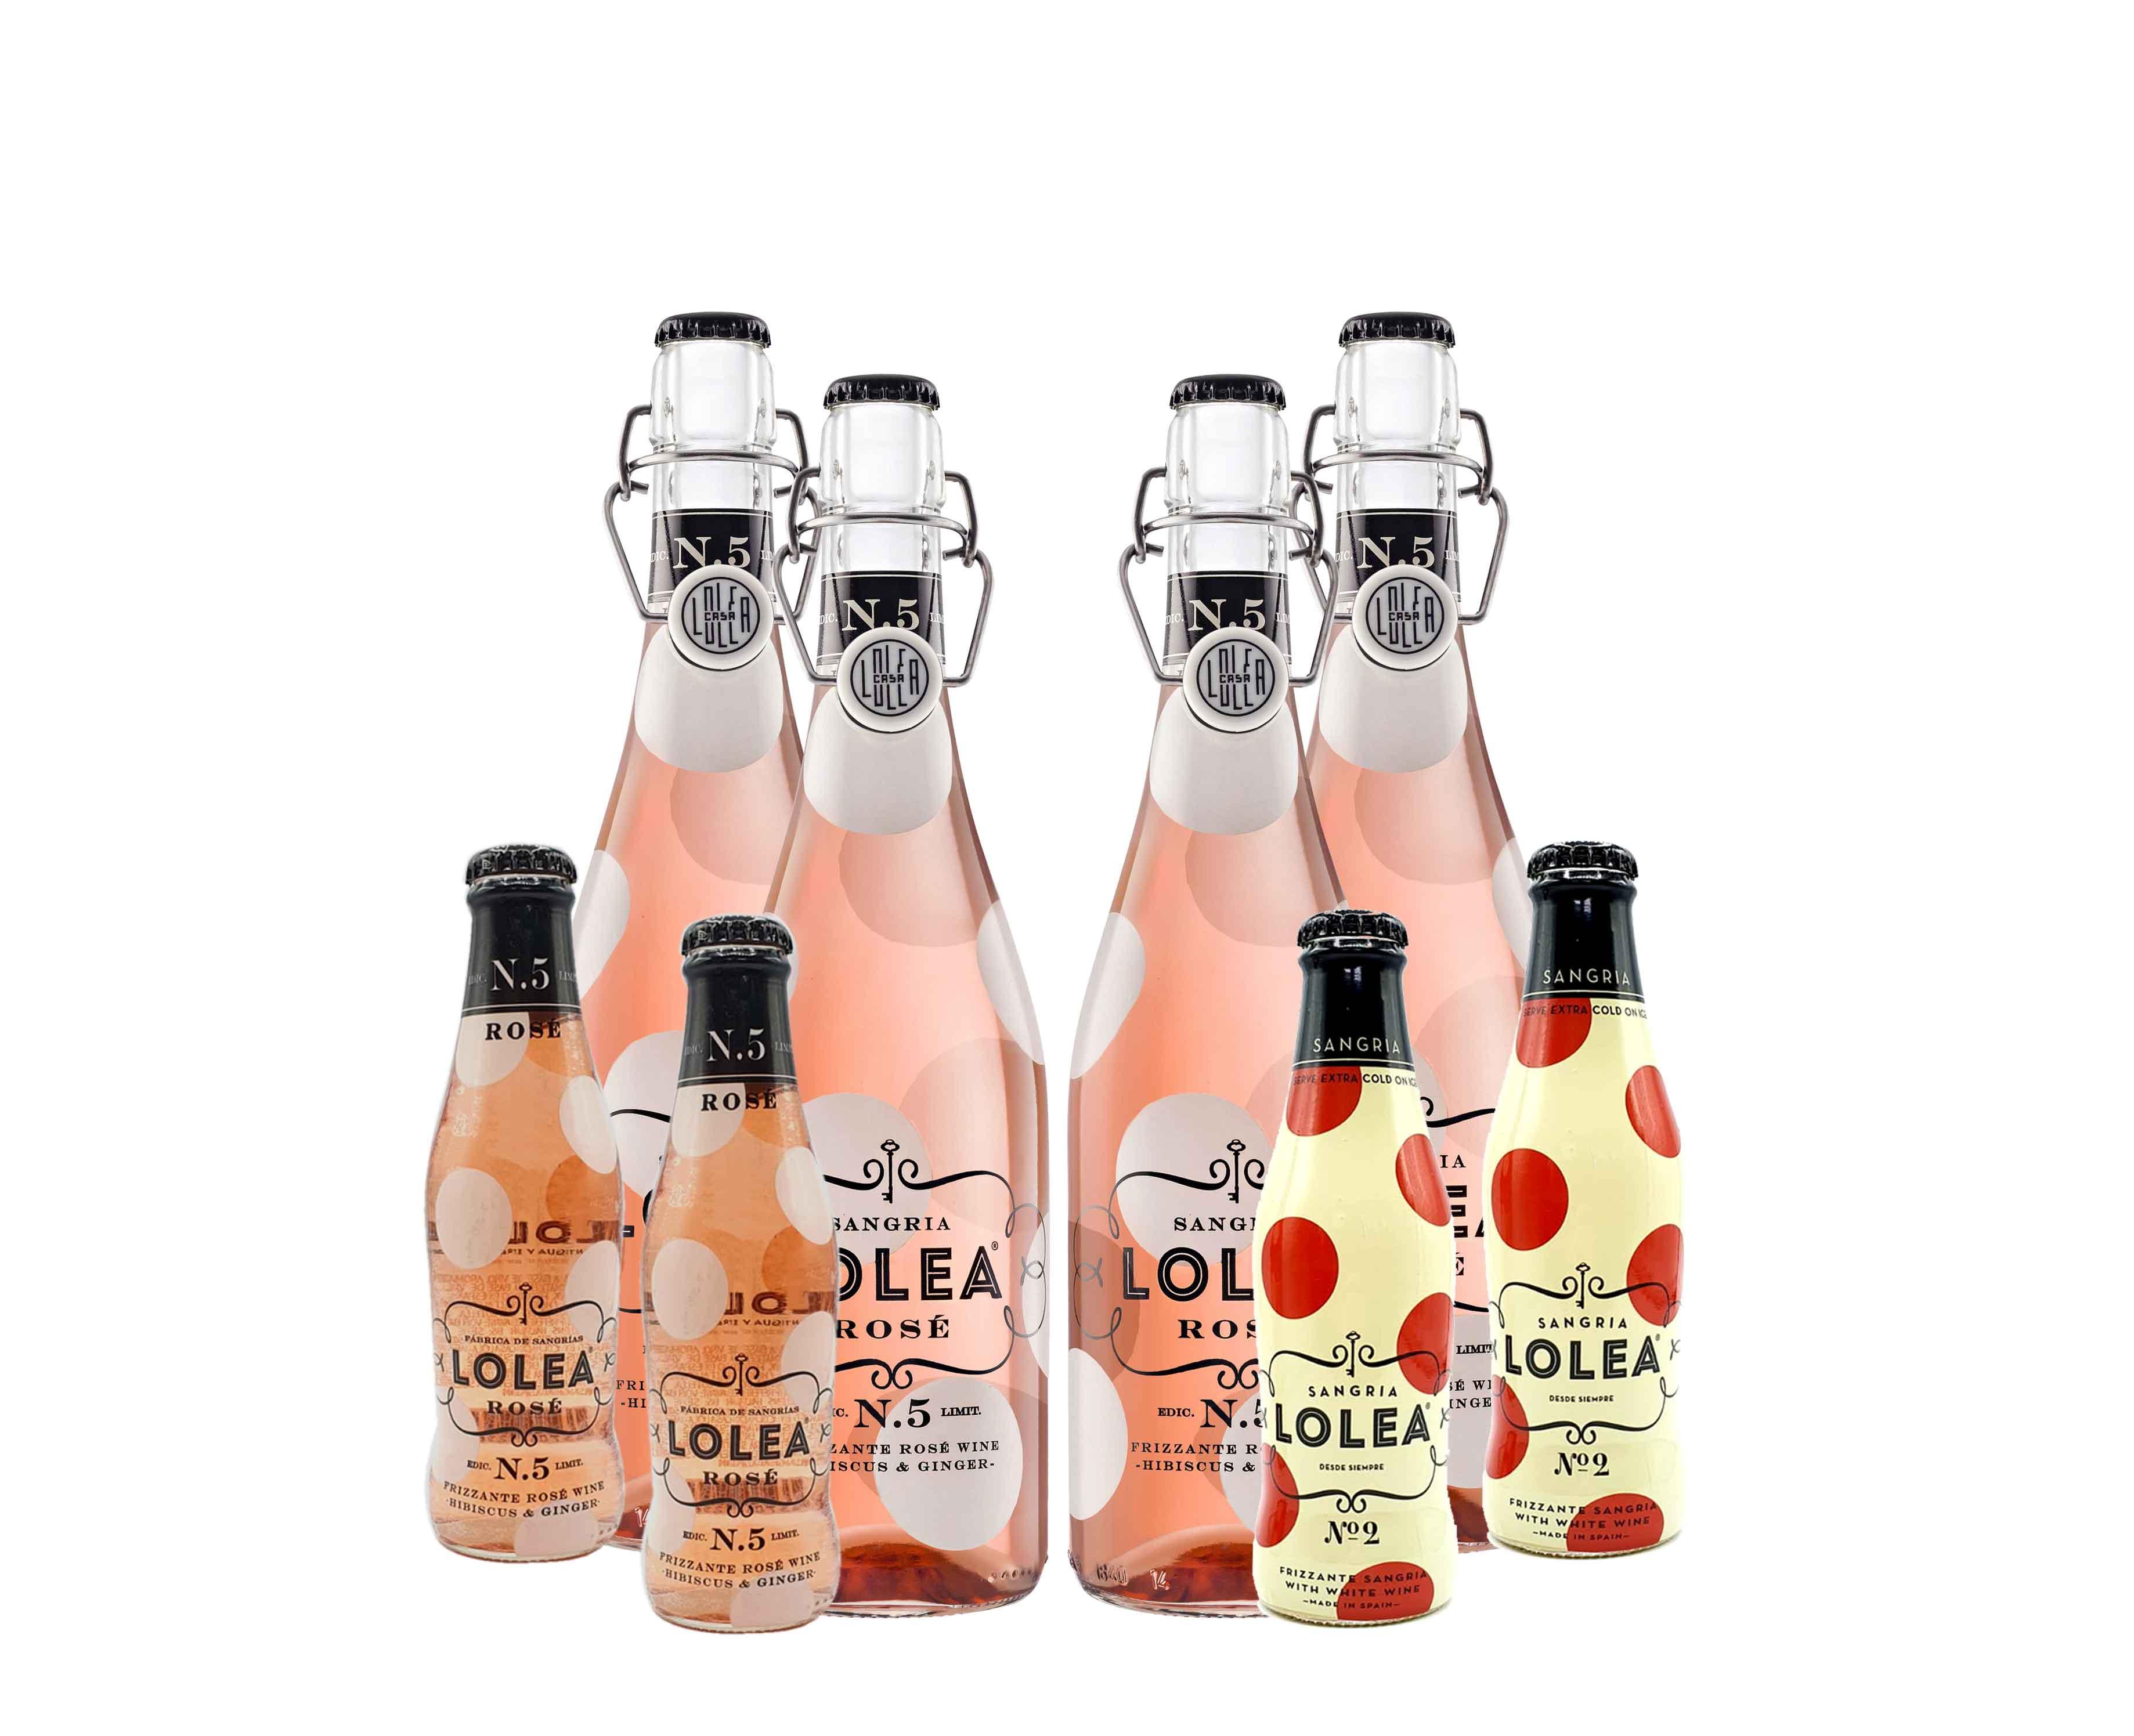 Lolea 4er Set Sangria N°5 ROSE 0,75L (8% Vol) 4x Rosewein + 4 Minis GRATIS 2xROSE 0,2L (8% Vol) 2xWEIß 0,2L (7% Vol) GRATIS [Enthält Sulfite]